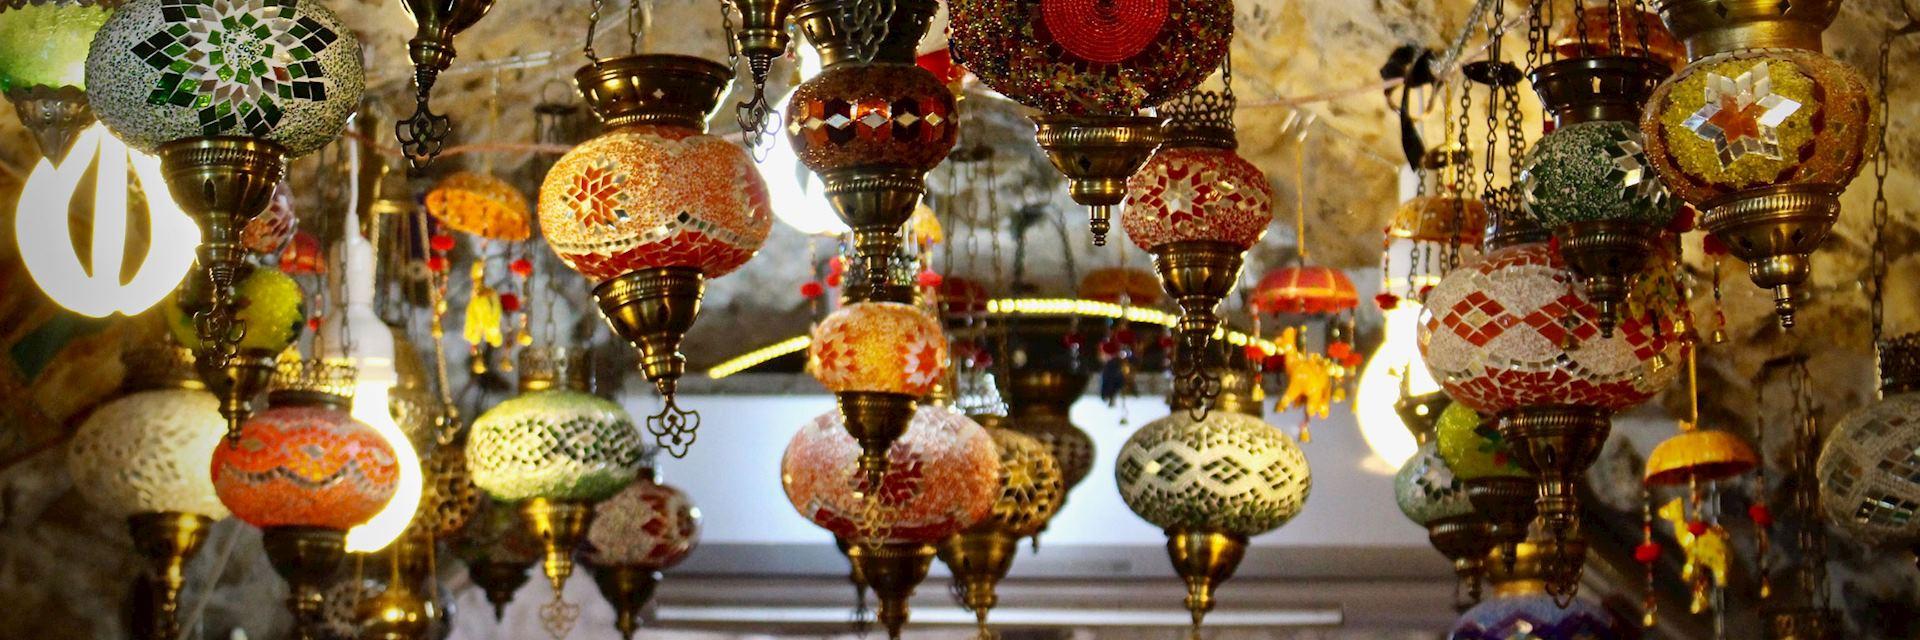 Lamps for sale in old Jerusalem